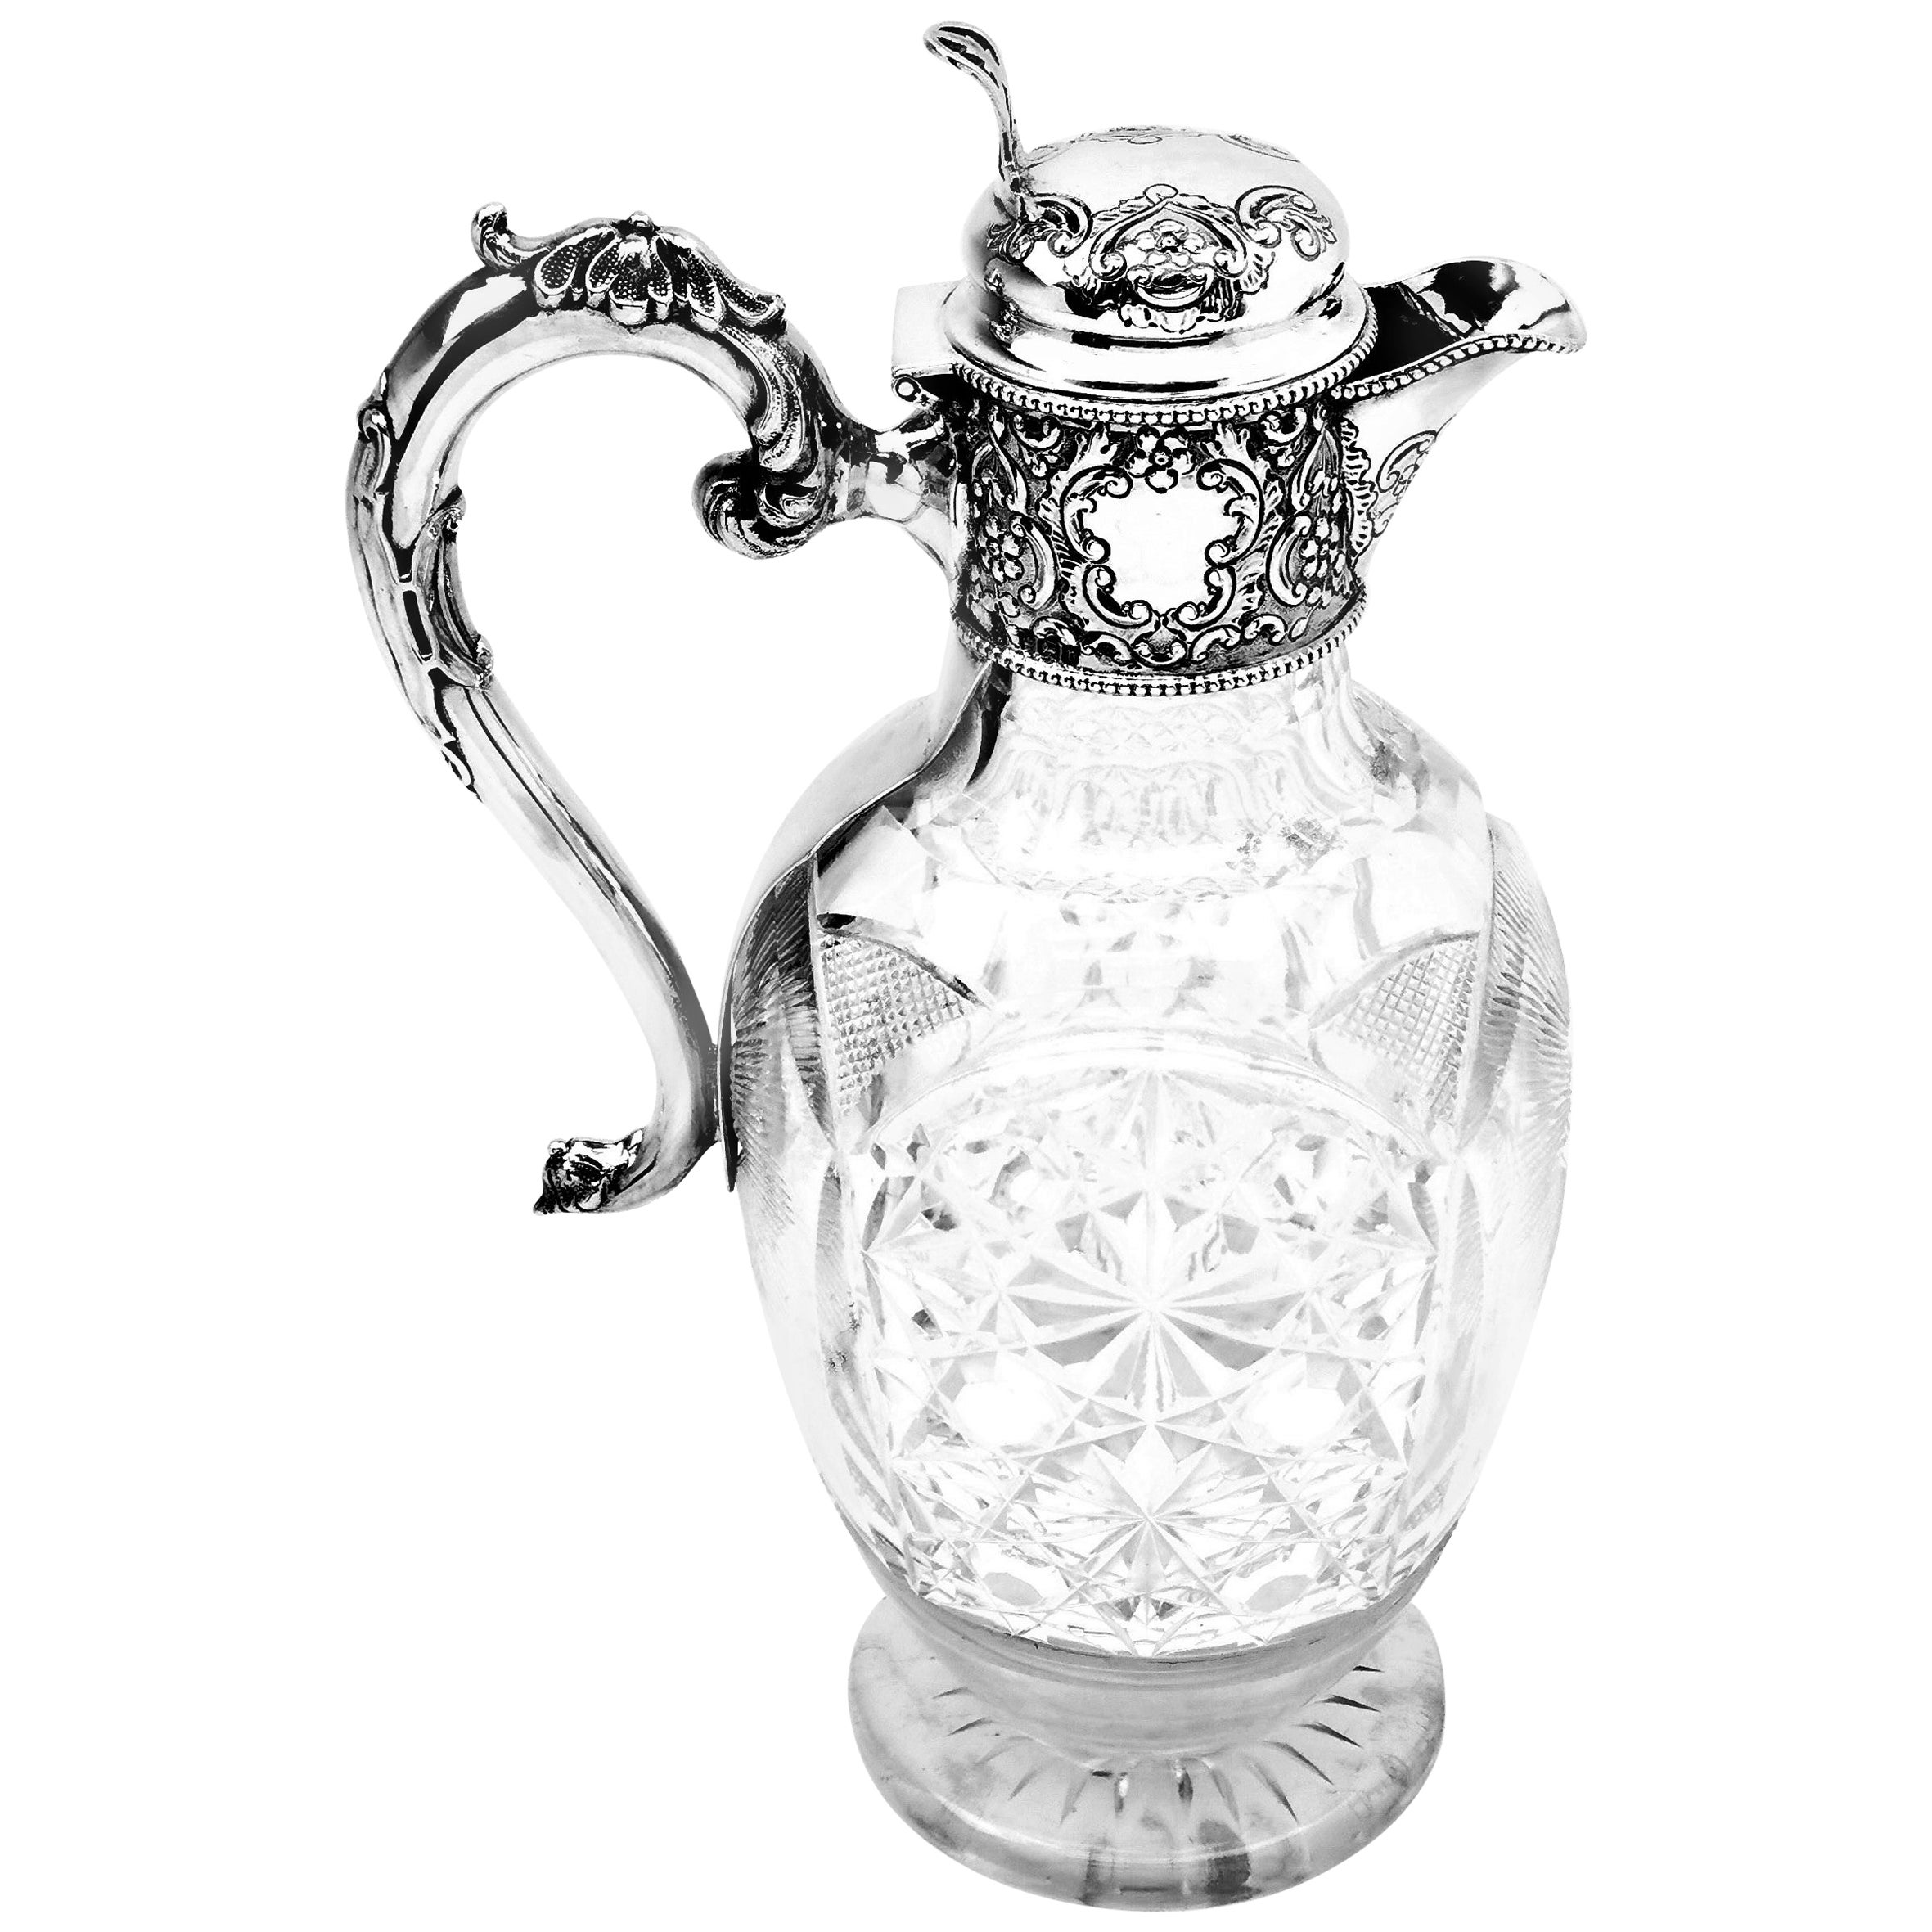 Antique Solid Silver & Cut Glass Claret Jug Wine Decanter, 1909